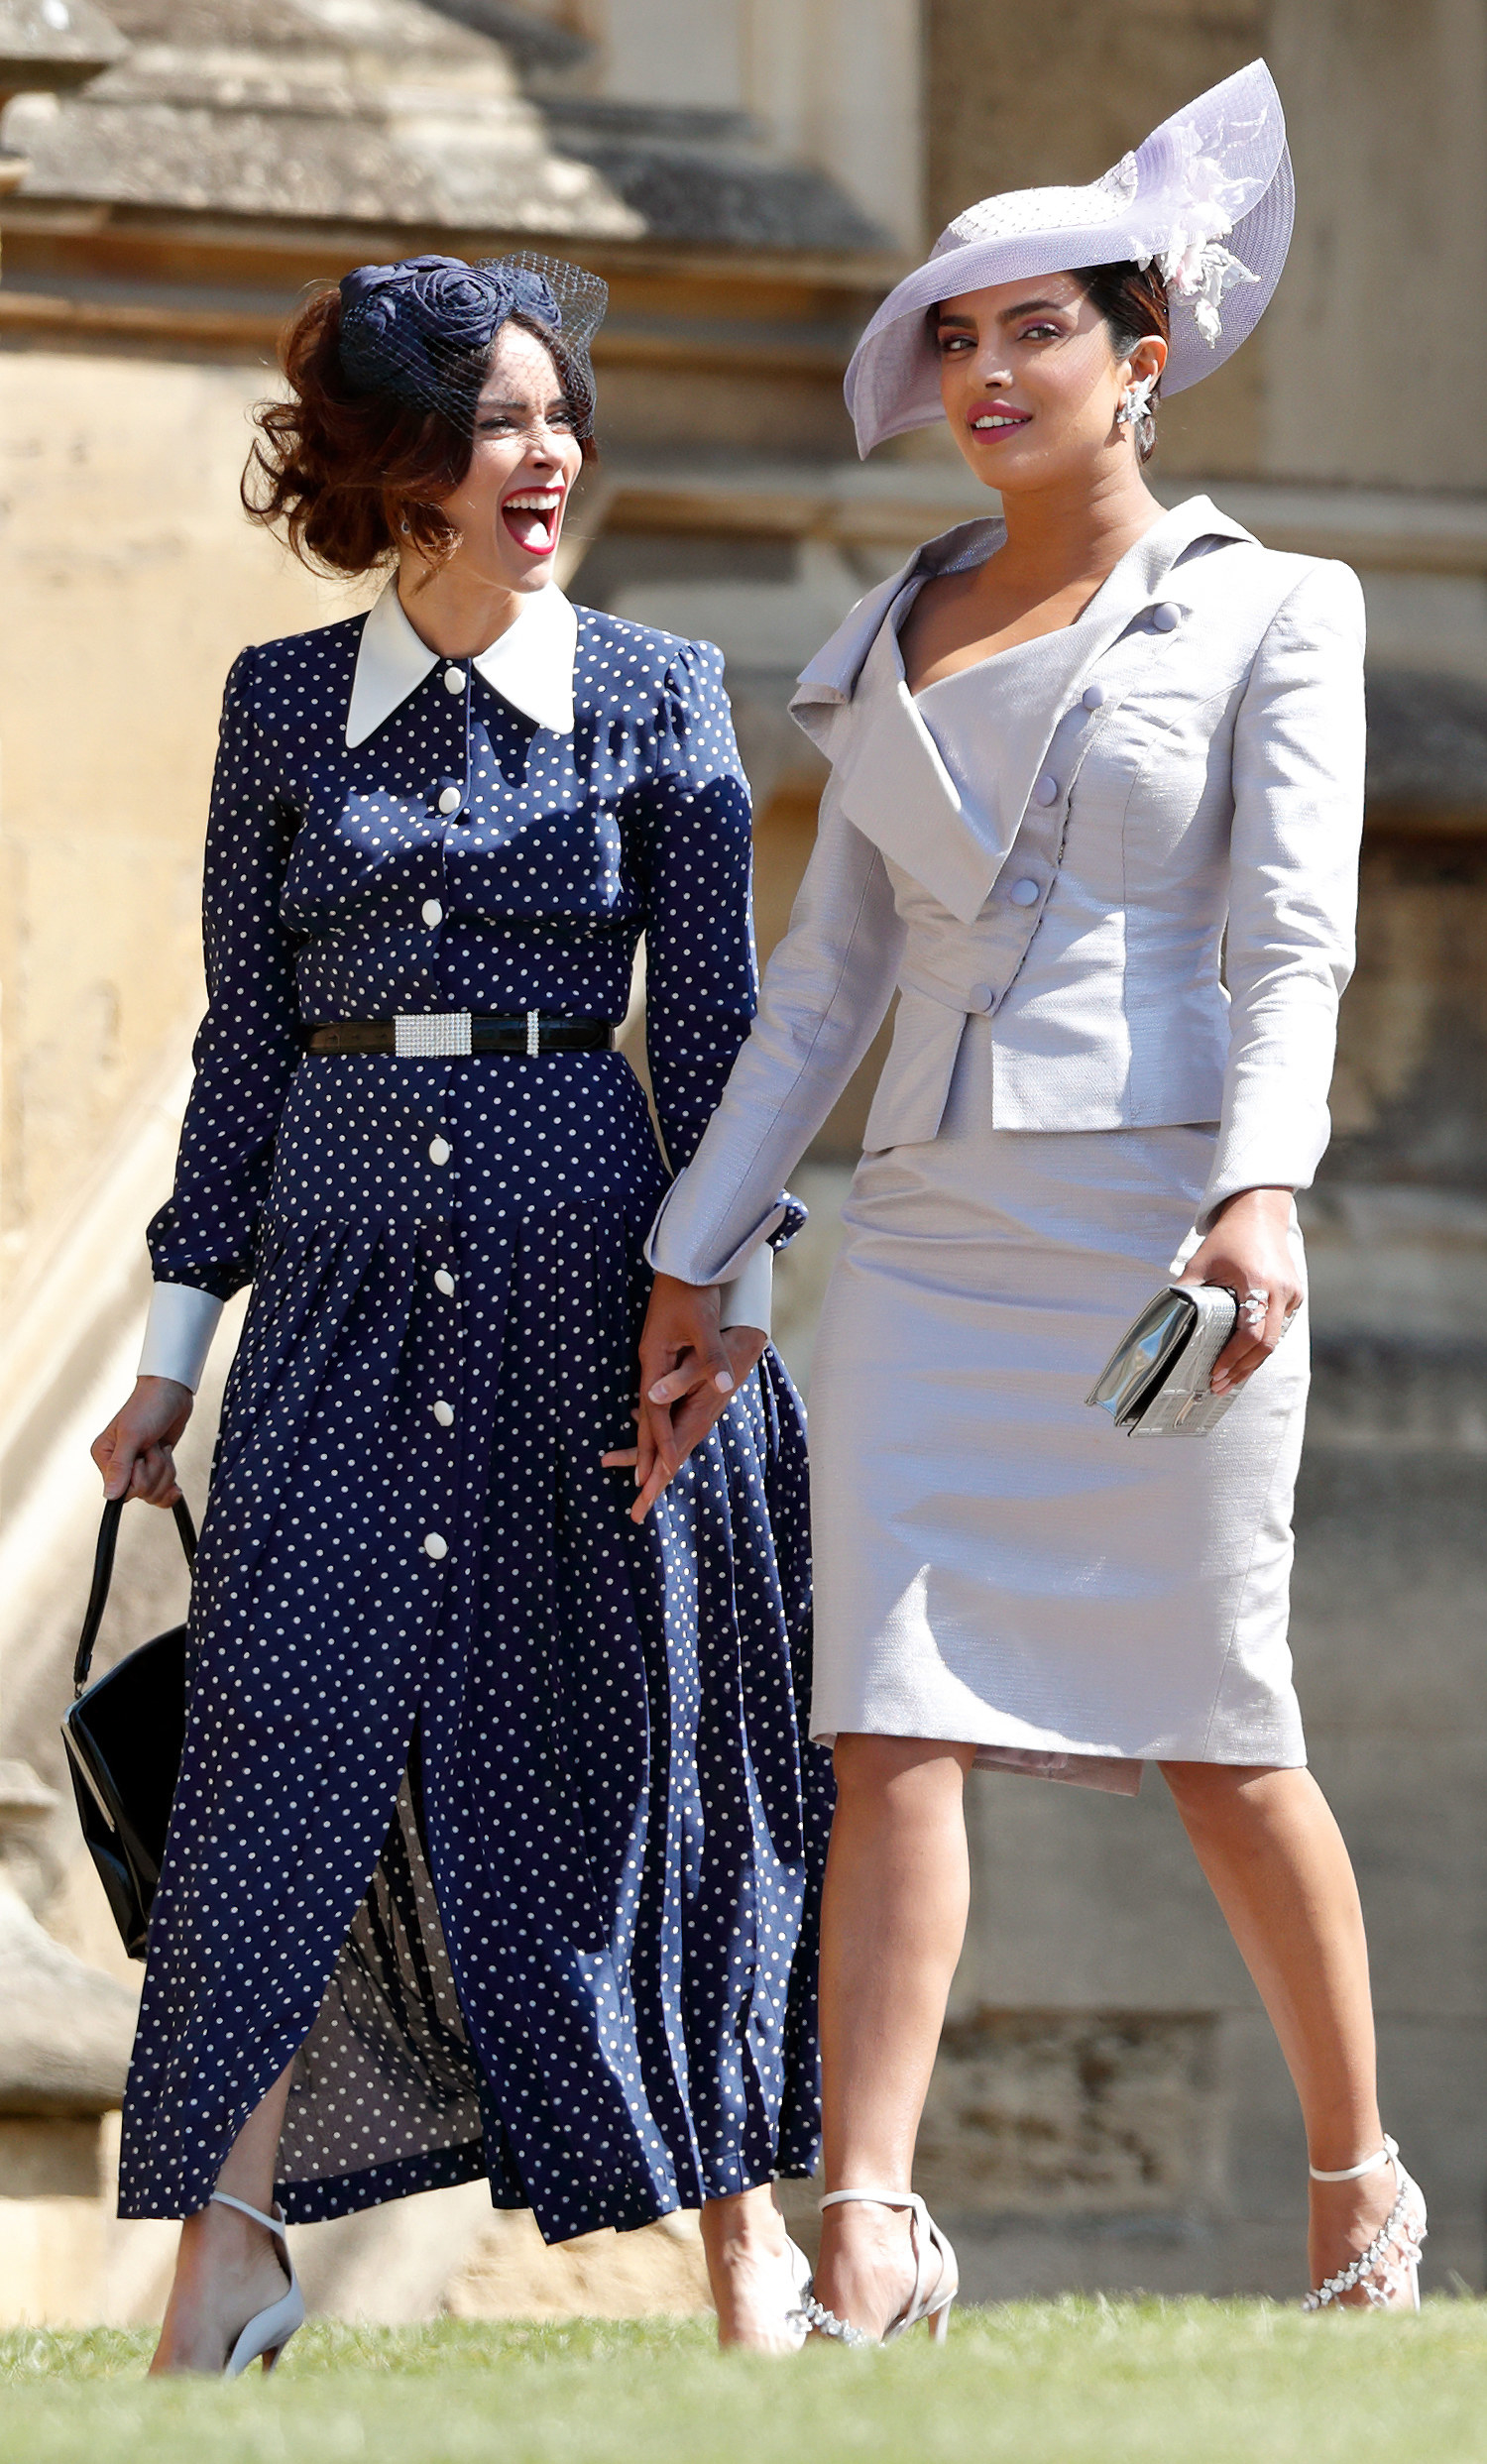 Abigail Spencer and Priyanka Chopra arrive at Prince Harry and Meghan Markle's 2018 wedding